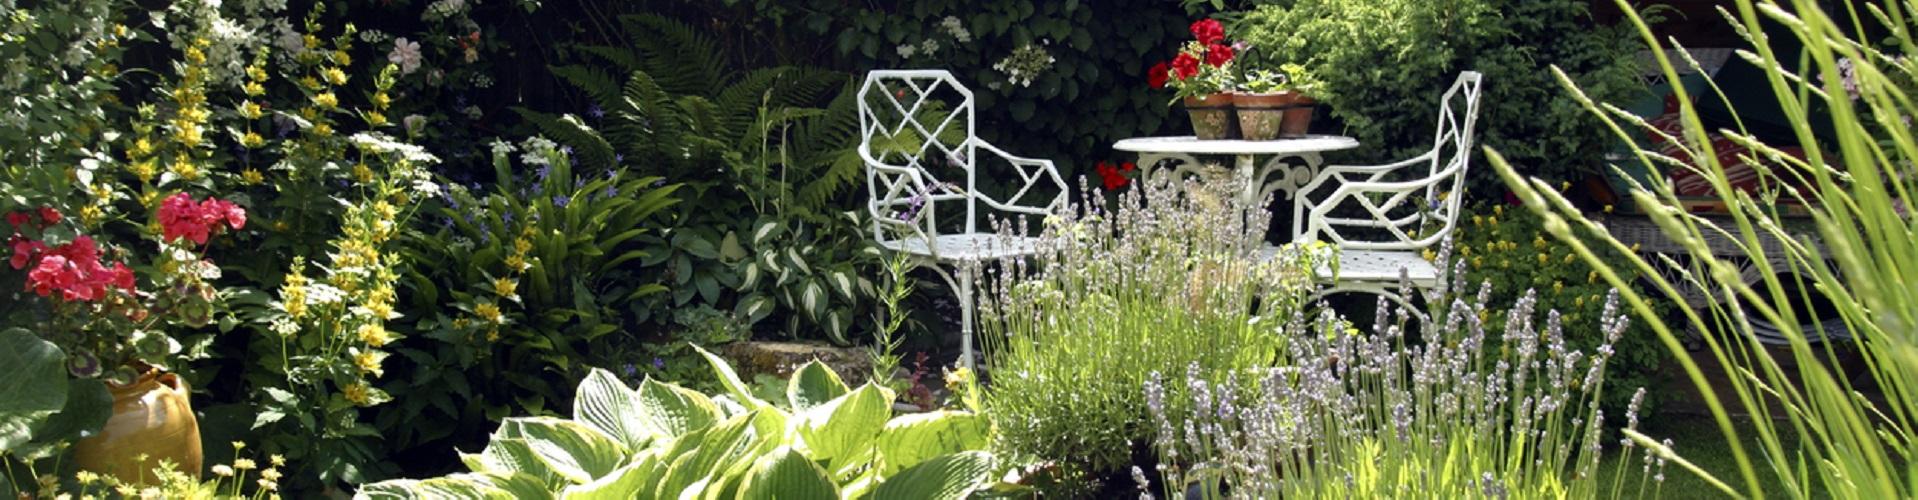 Amenager-Un-Petit-Jardin-Grand-Resultat | Govaplast serapportantà Amanager Un Petit Jardin